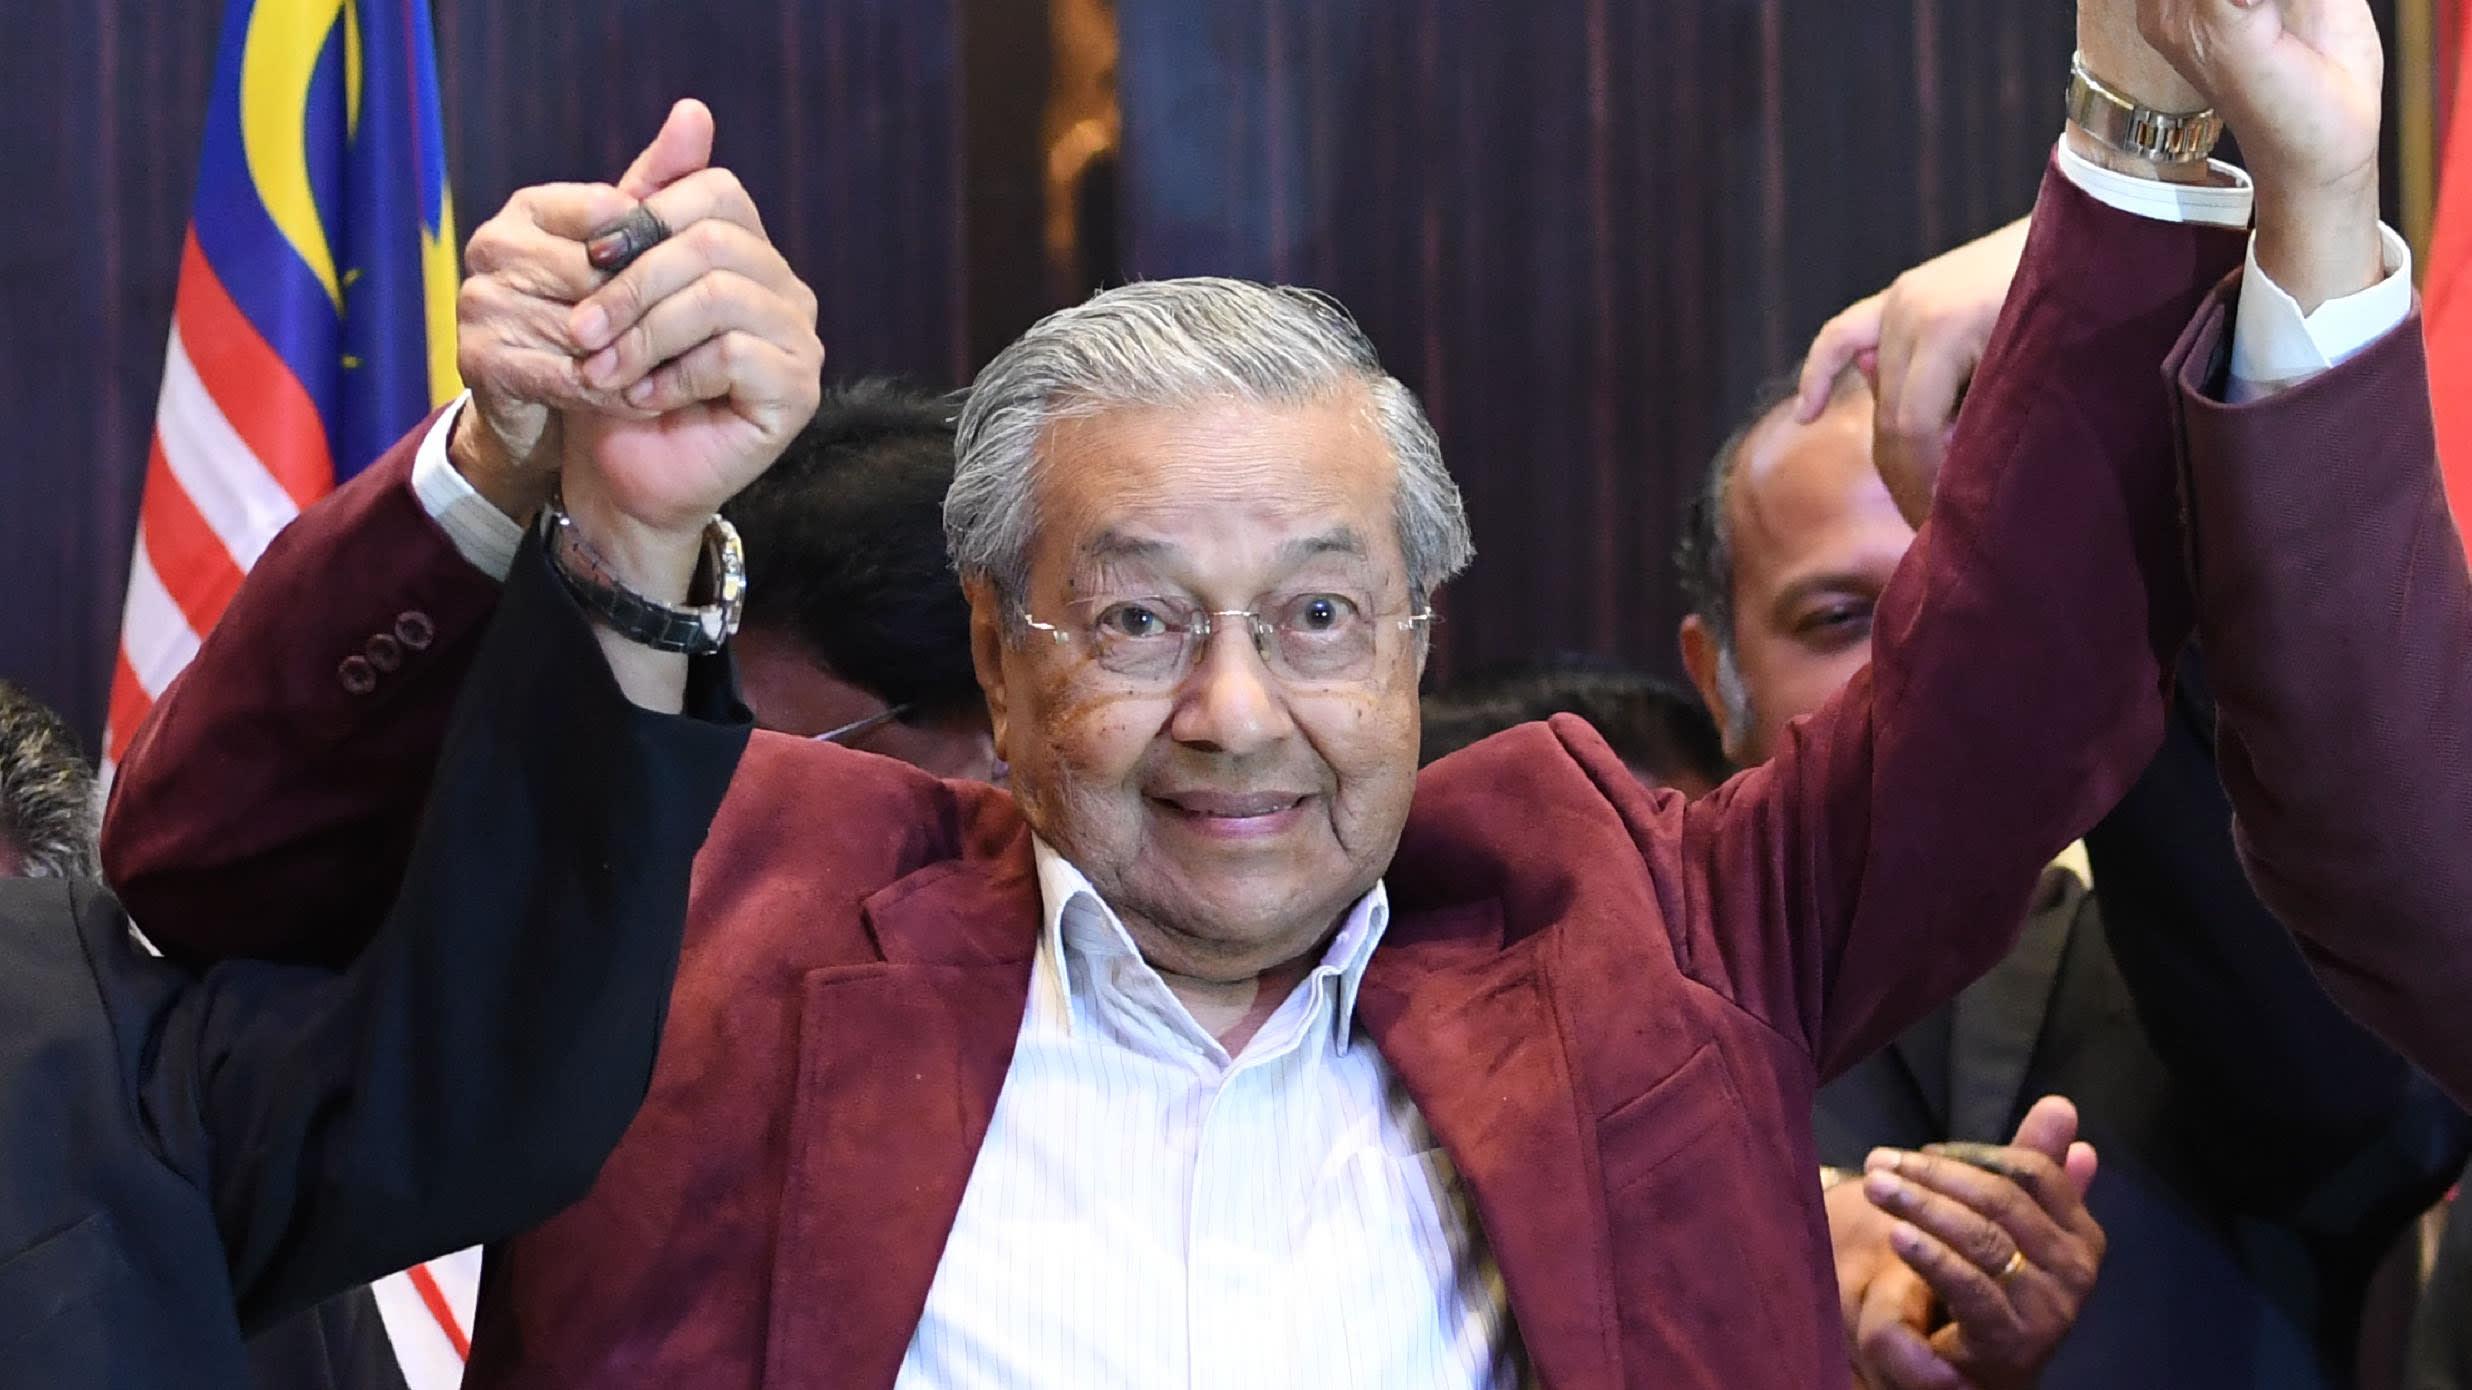 Malaysia election winner 10 May 2018 Mahathir Mohamad